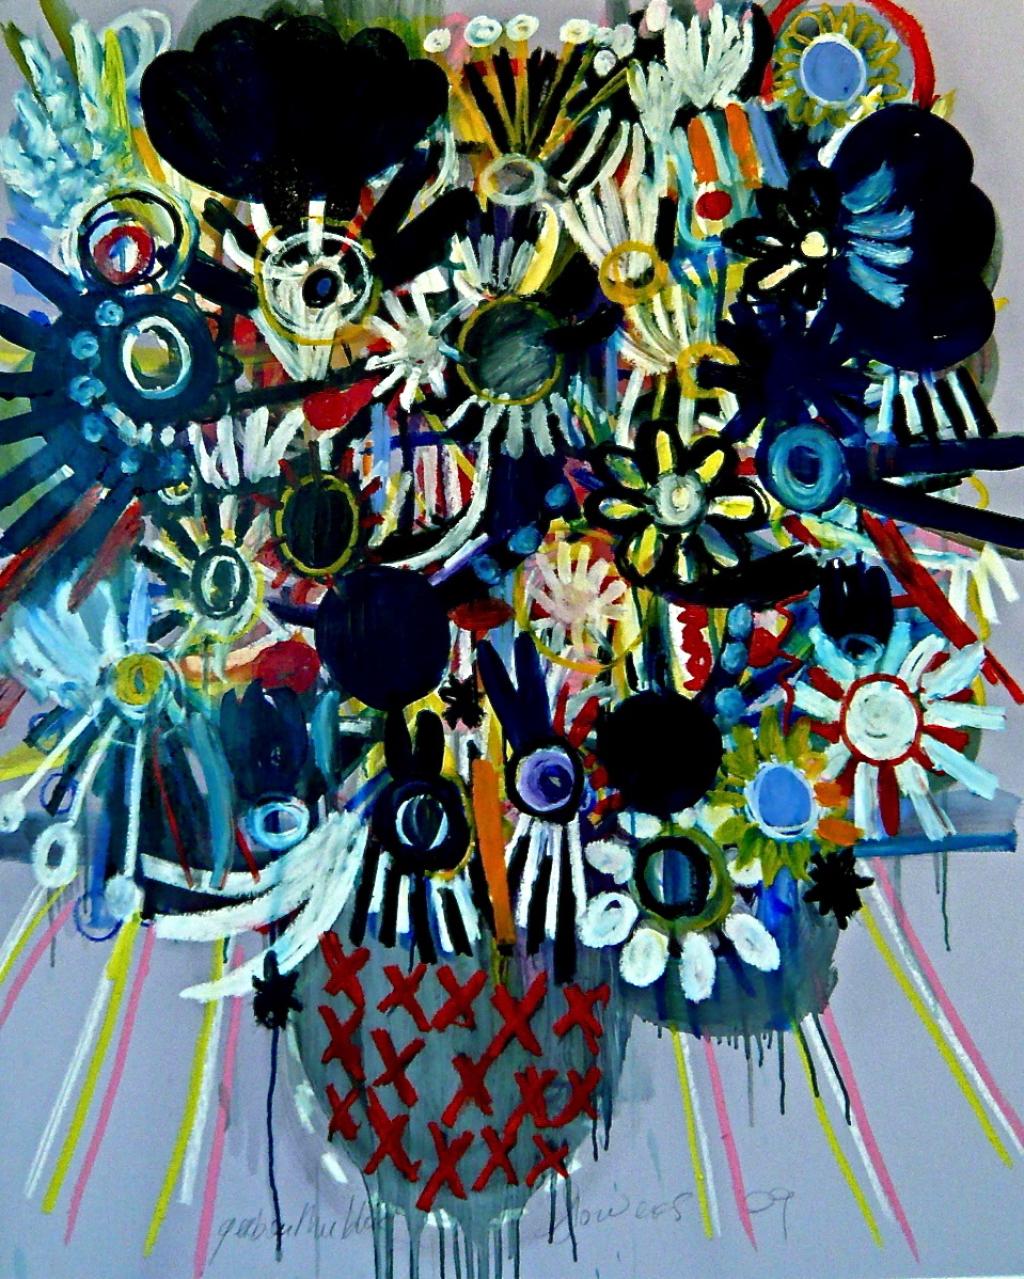 flowers in vase 4, 2009  Gerben Mulder